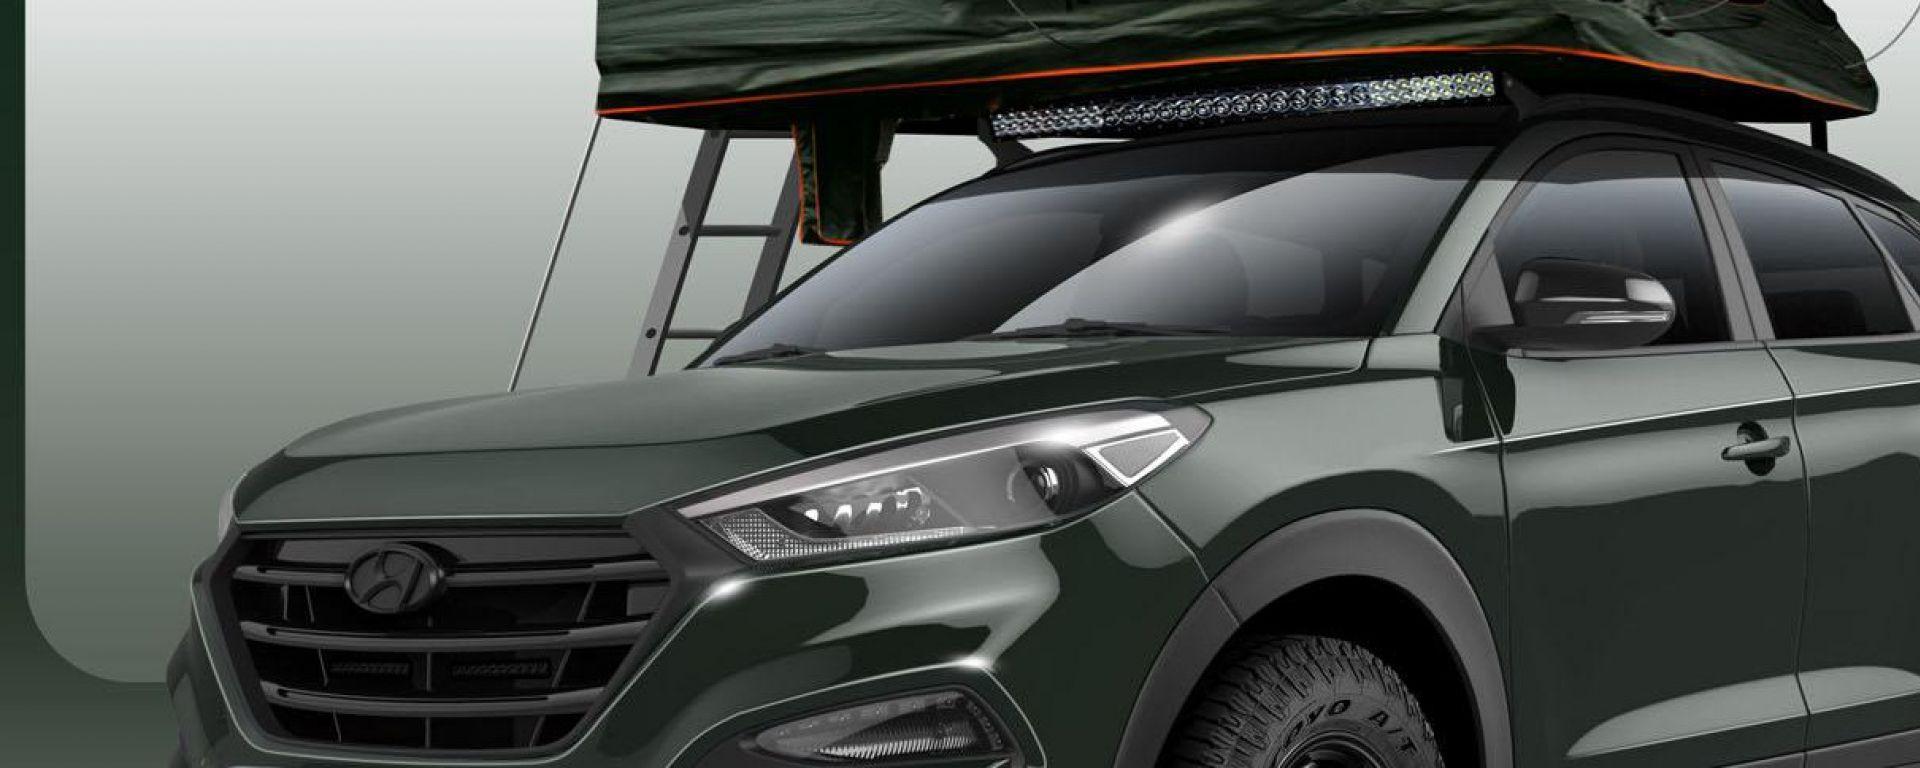 concept hyundai tucson adventuremobile motorbox. Black Bedroom Furniture Sets. Home Design Ideas